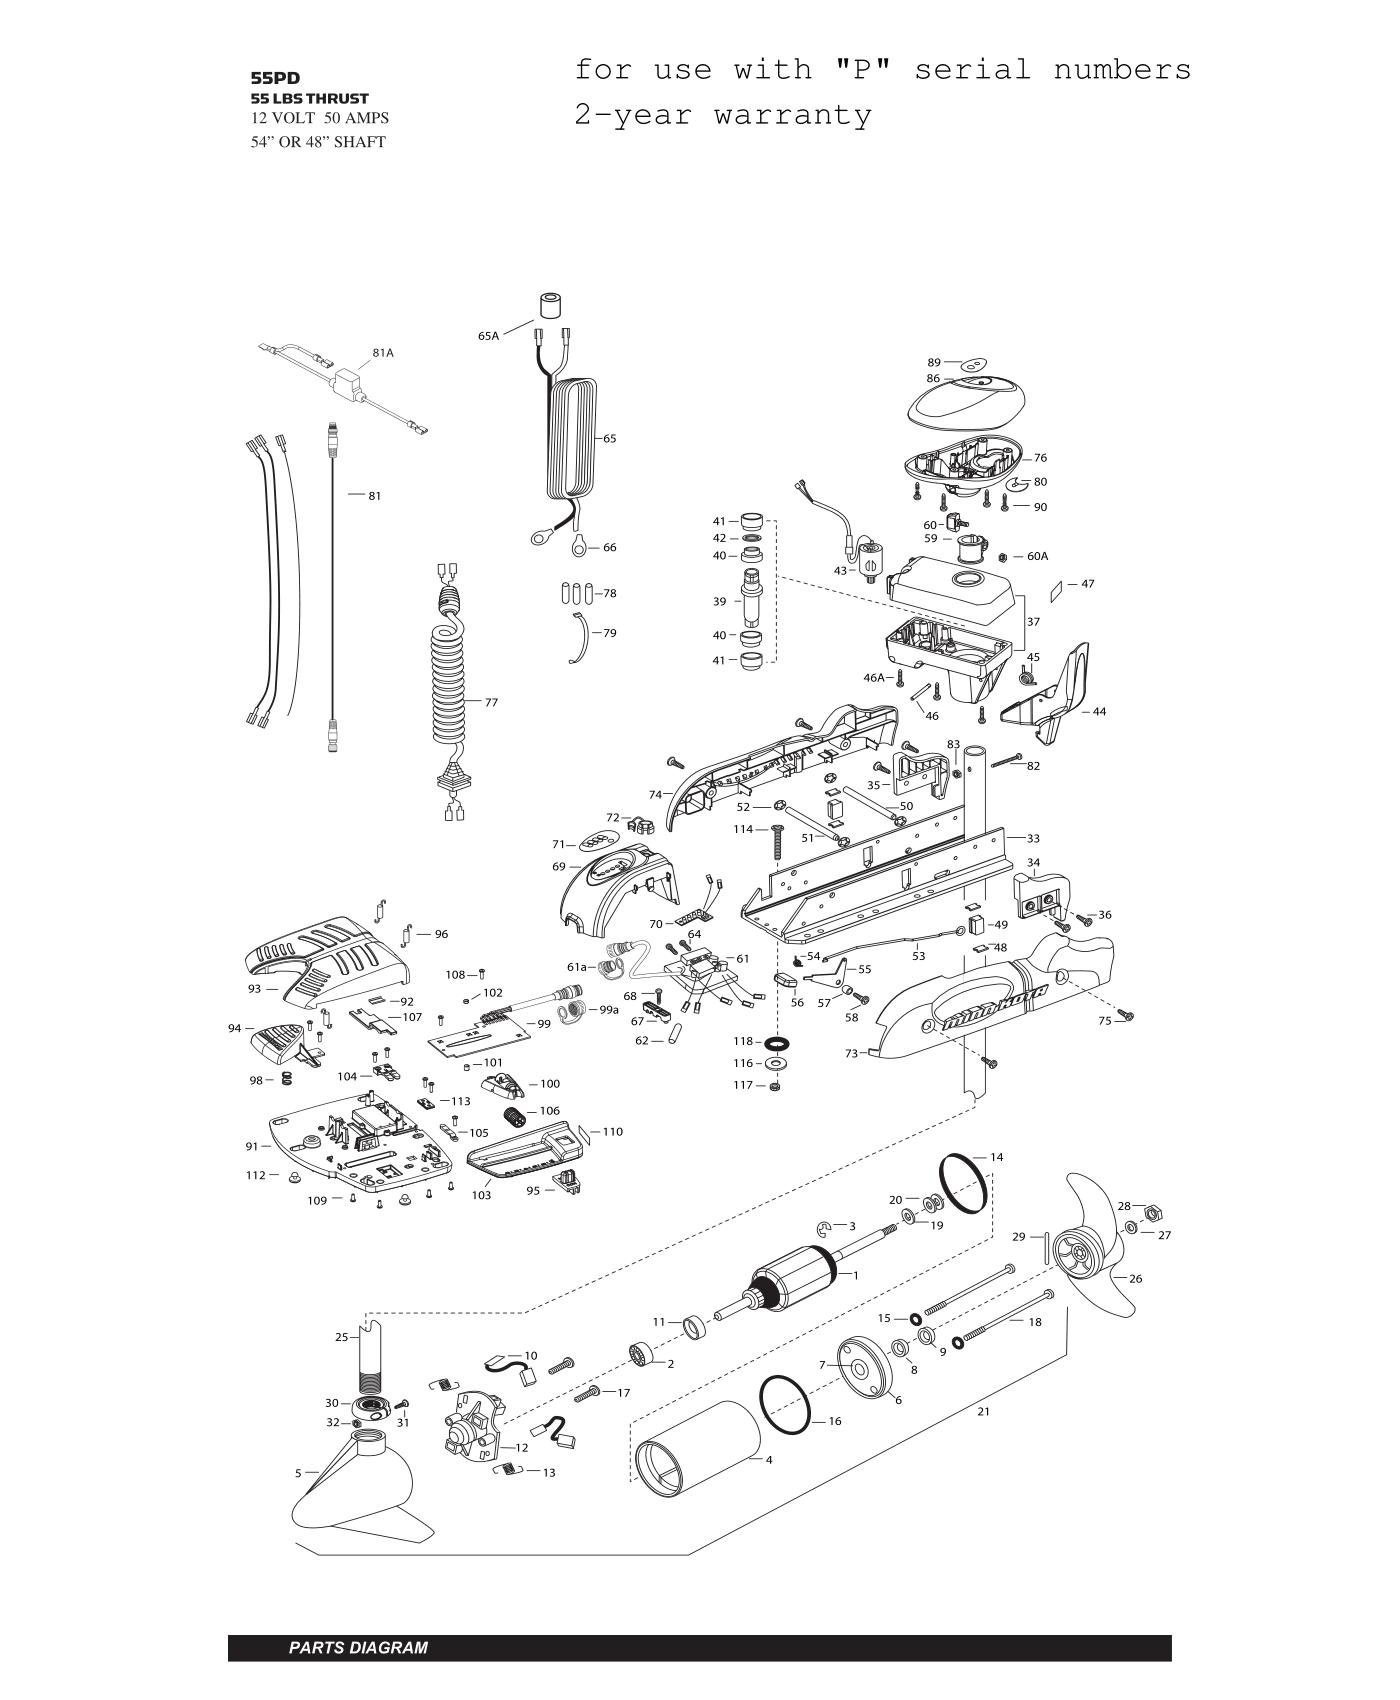 Minn Kota Powerdrive V2 55 Parts